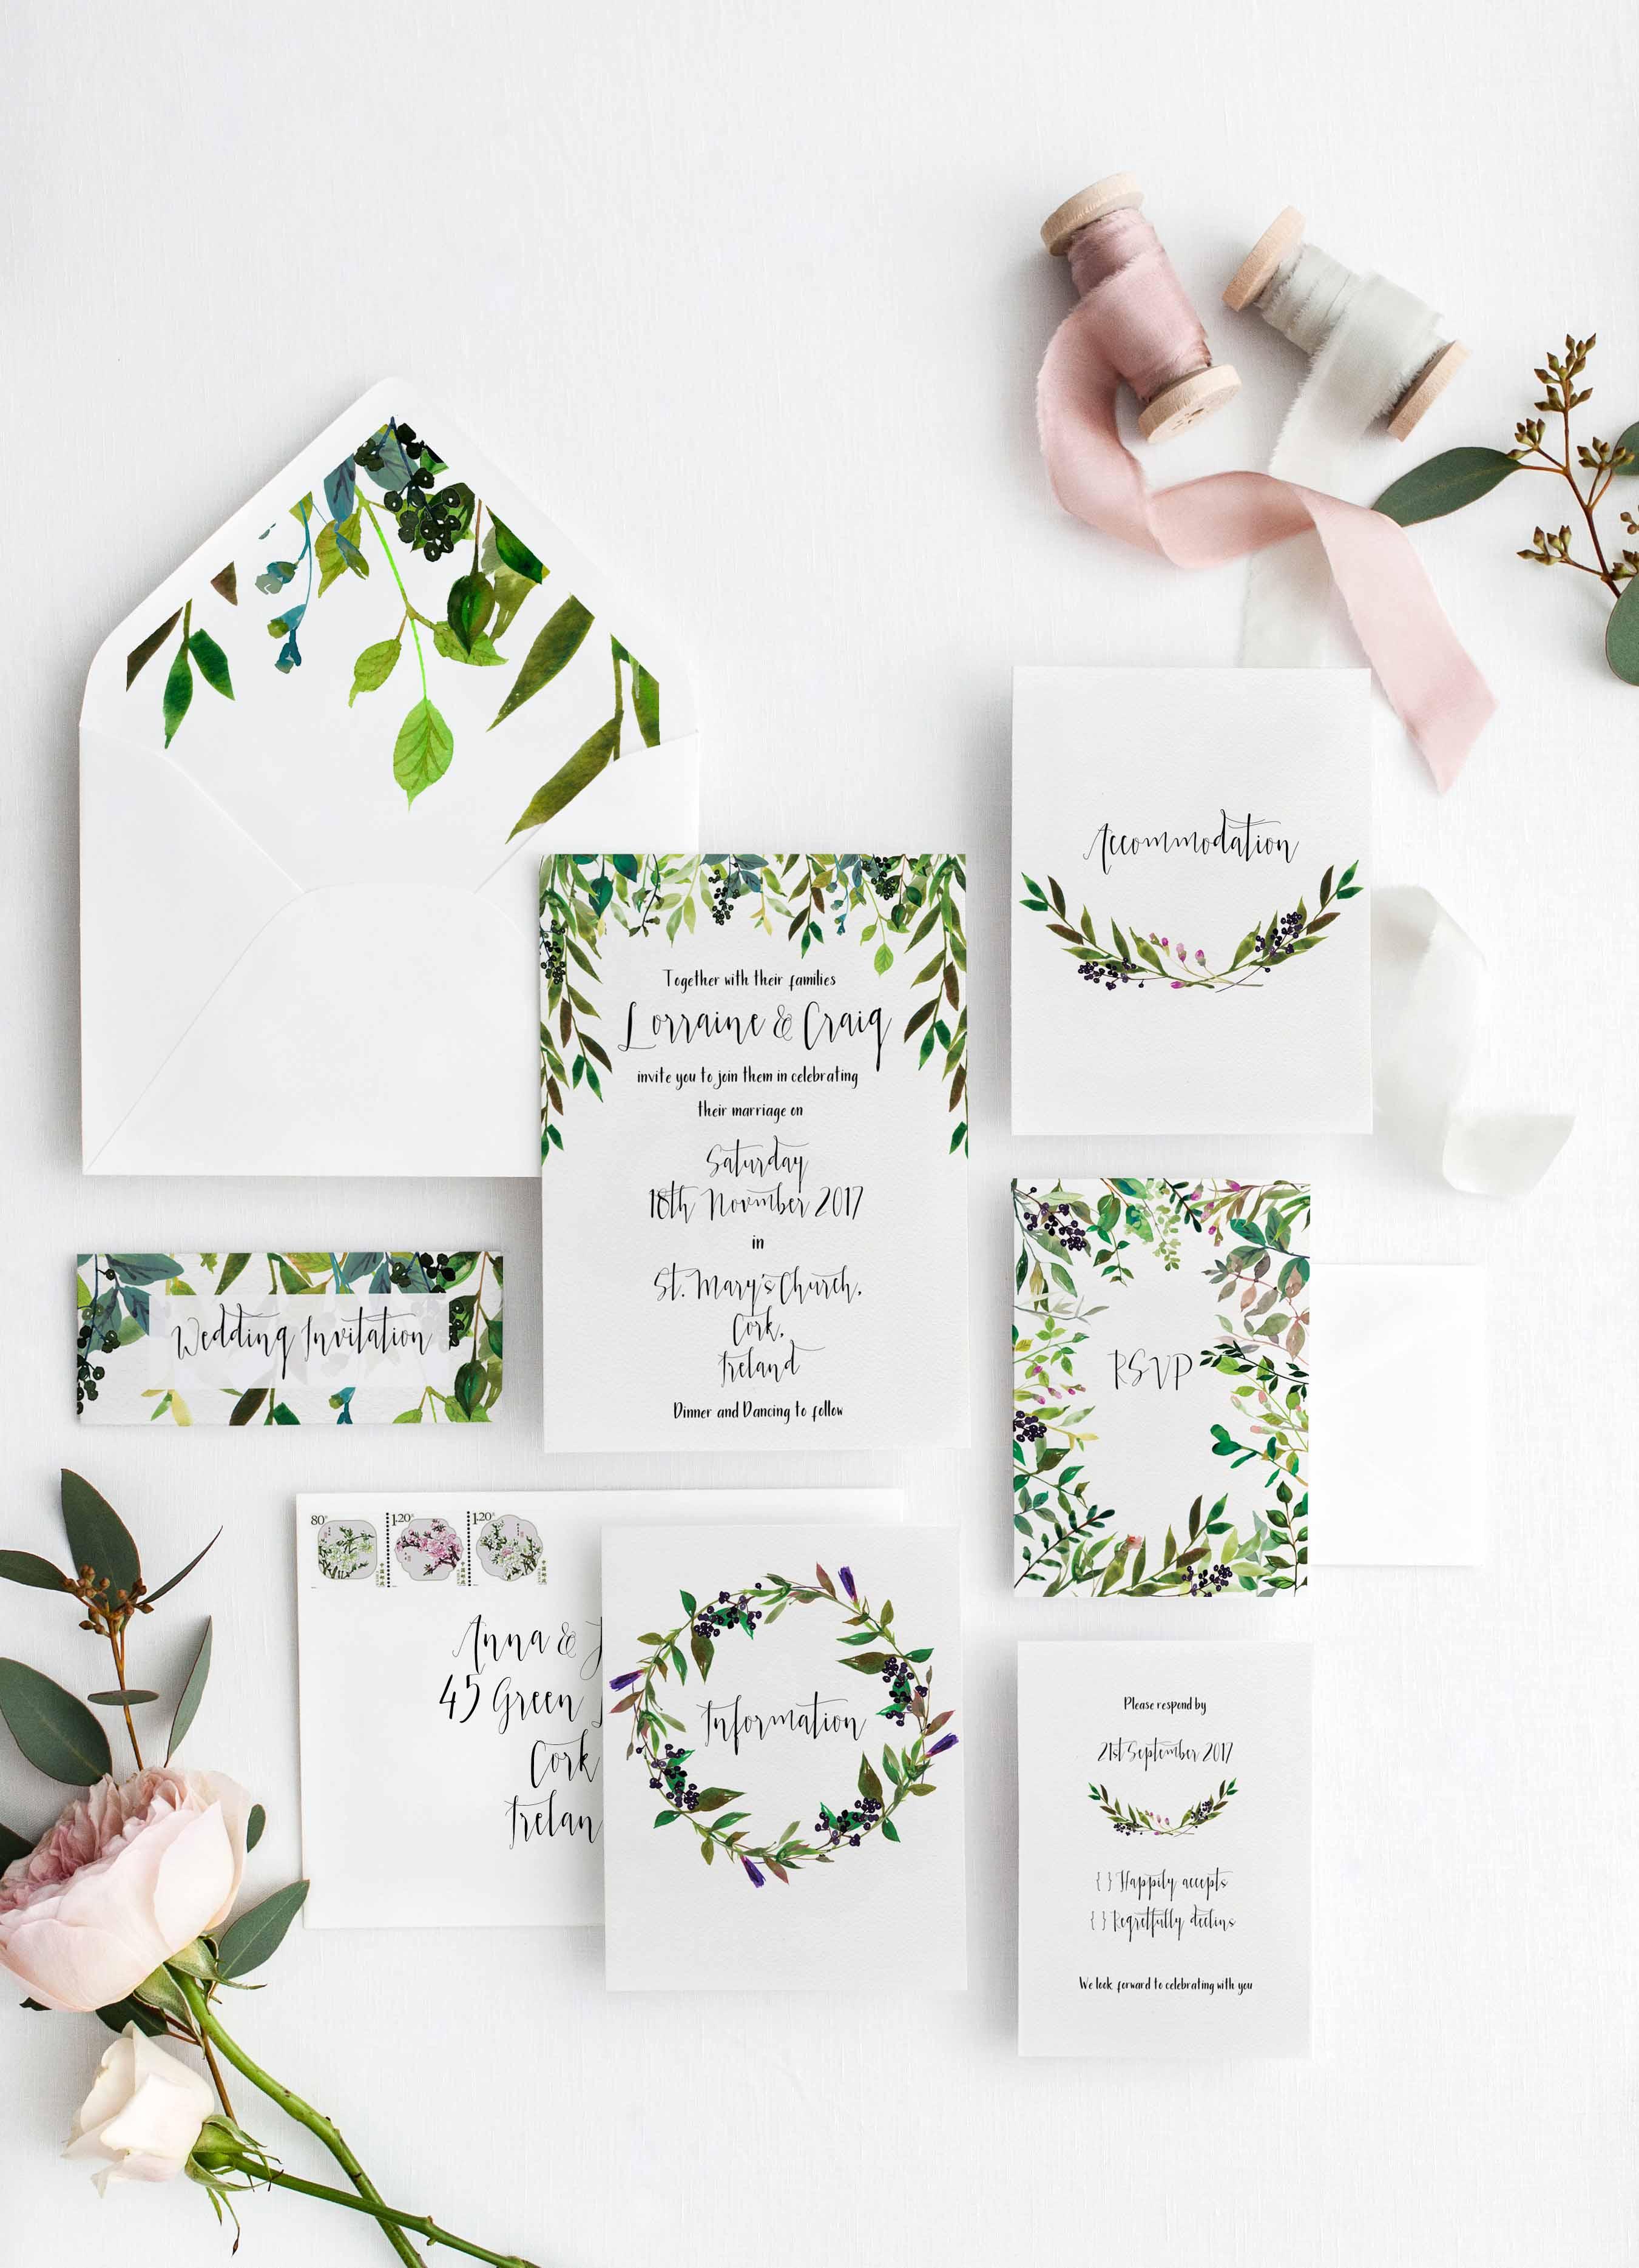 Personalised wedding invitations Greenery Invitations Green Invites ...